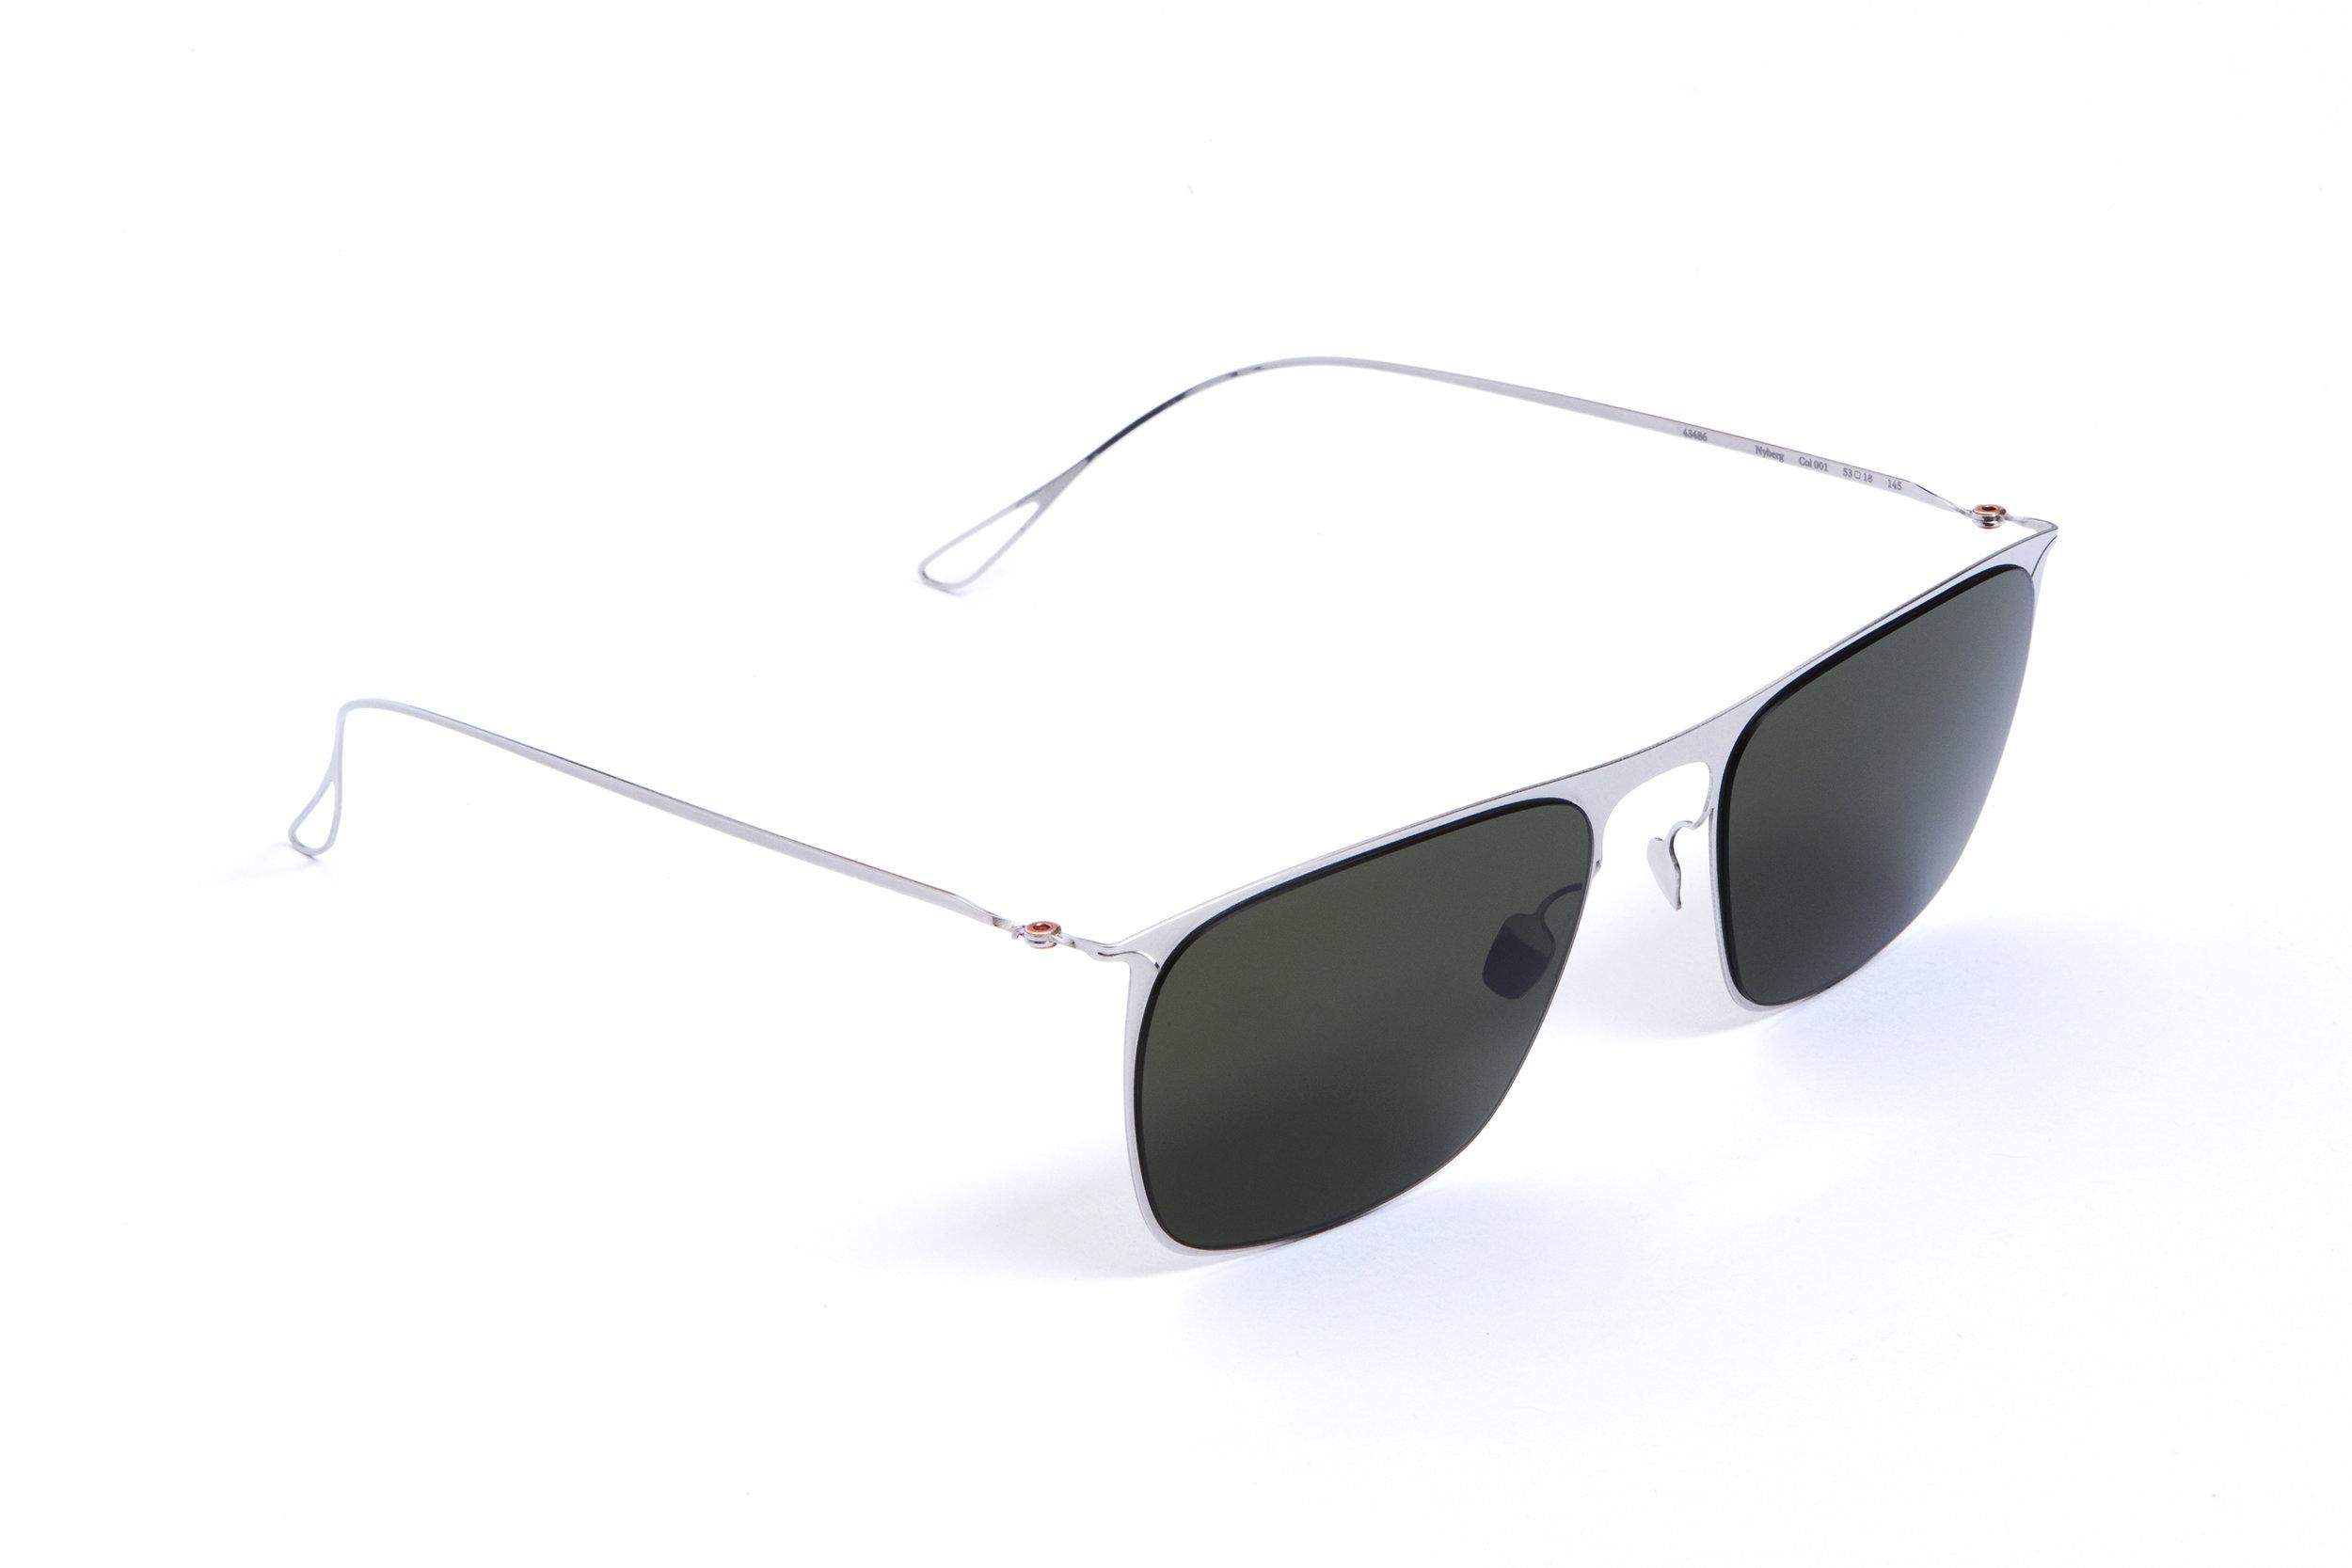 haffmans_neumeister_nyberg_silver_g15_ultralight_sunglasses_angle_102466.jpg